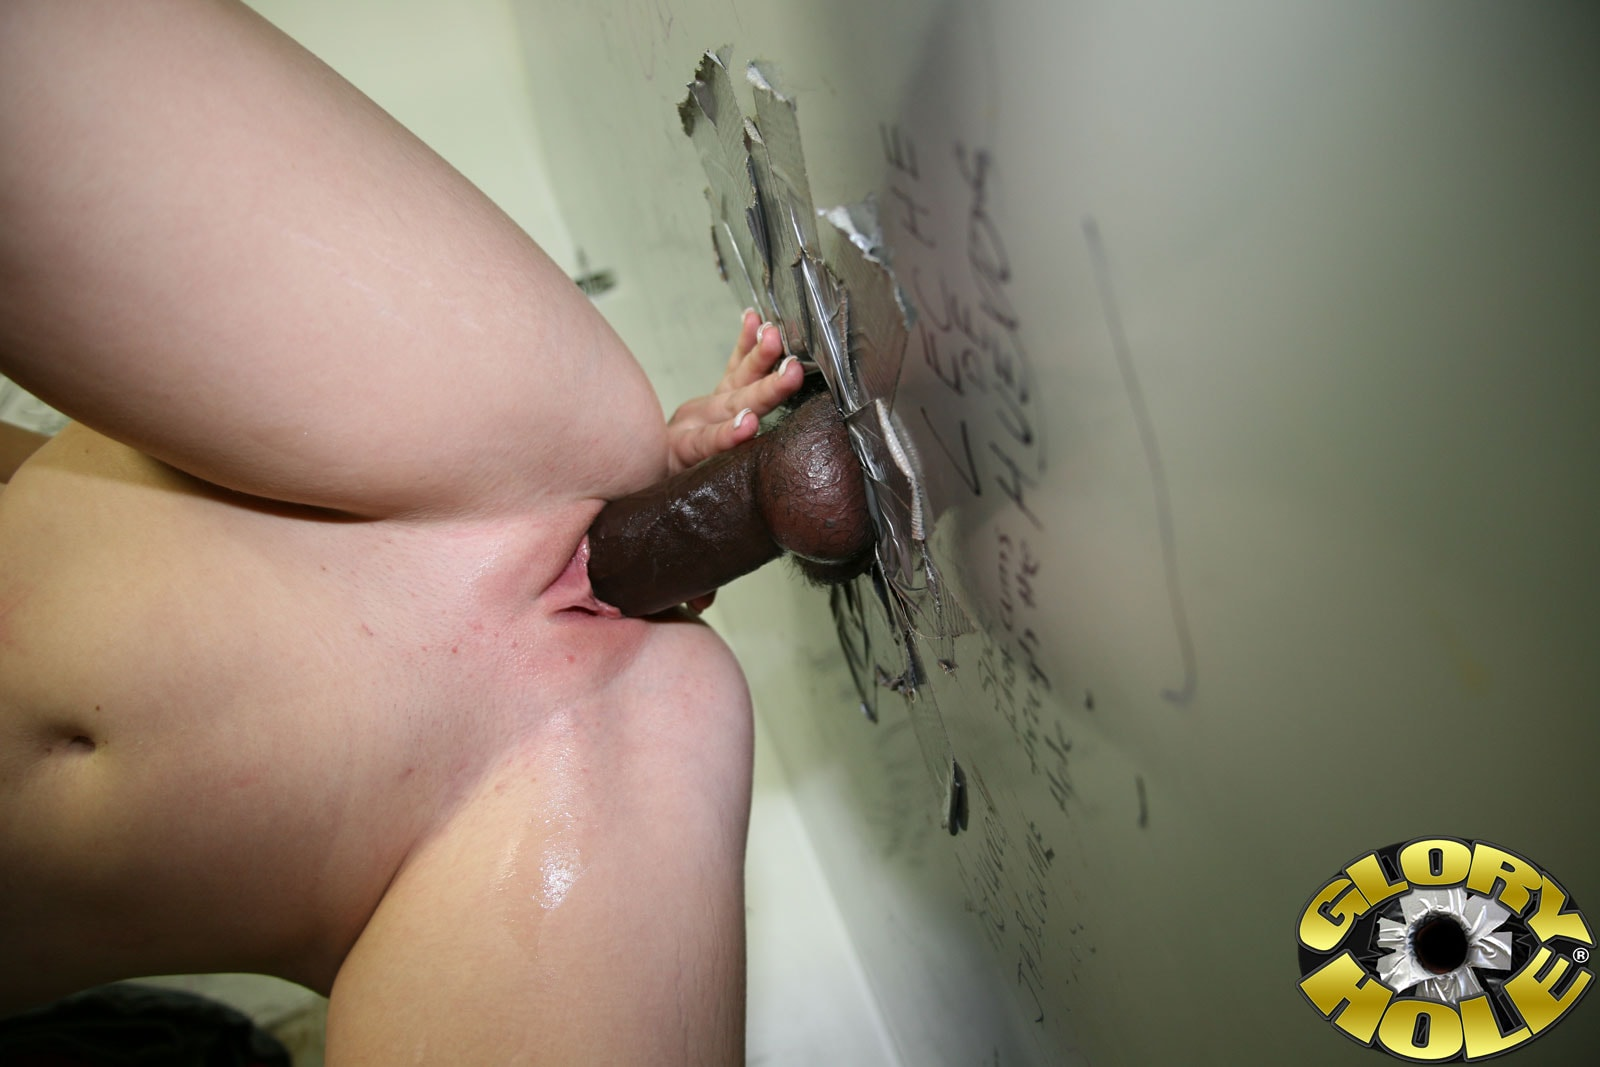 gloryhole-virgin-sex-images-miranda-cosgrpv-fake-porn